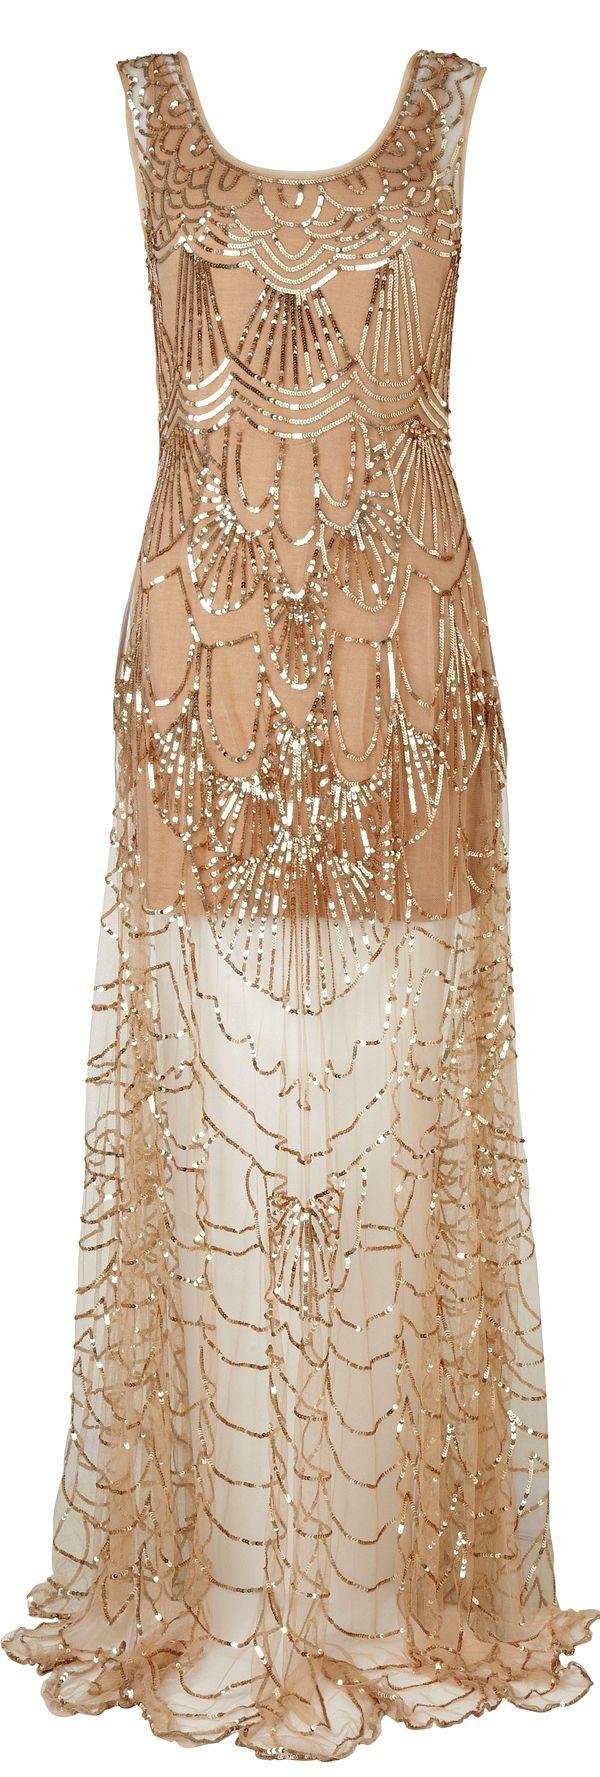 1920 dresses to buy